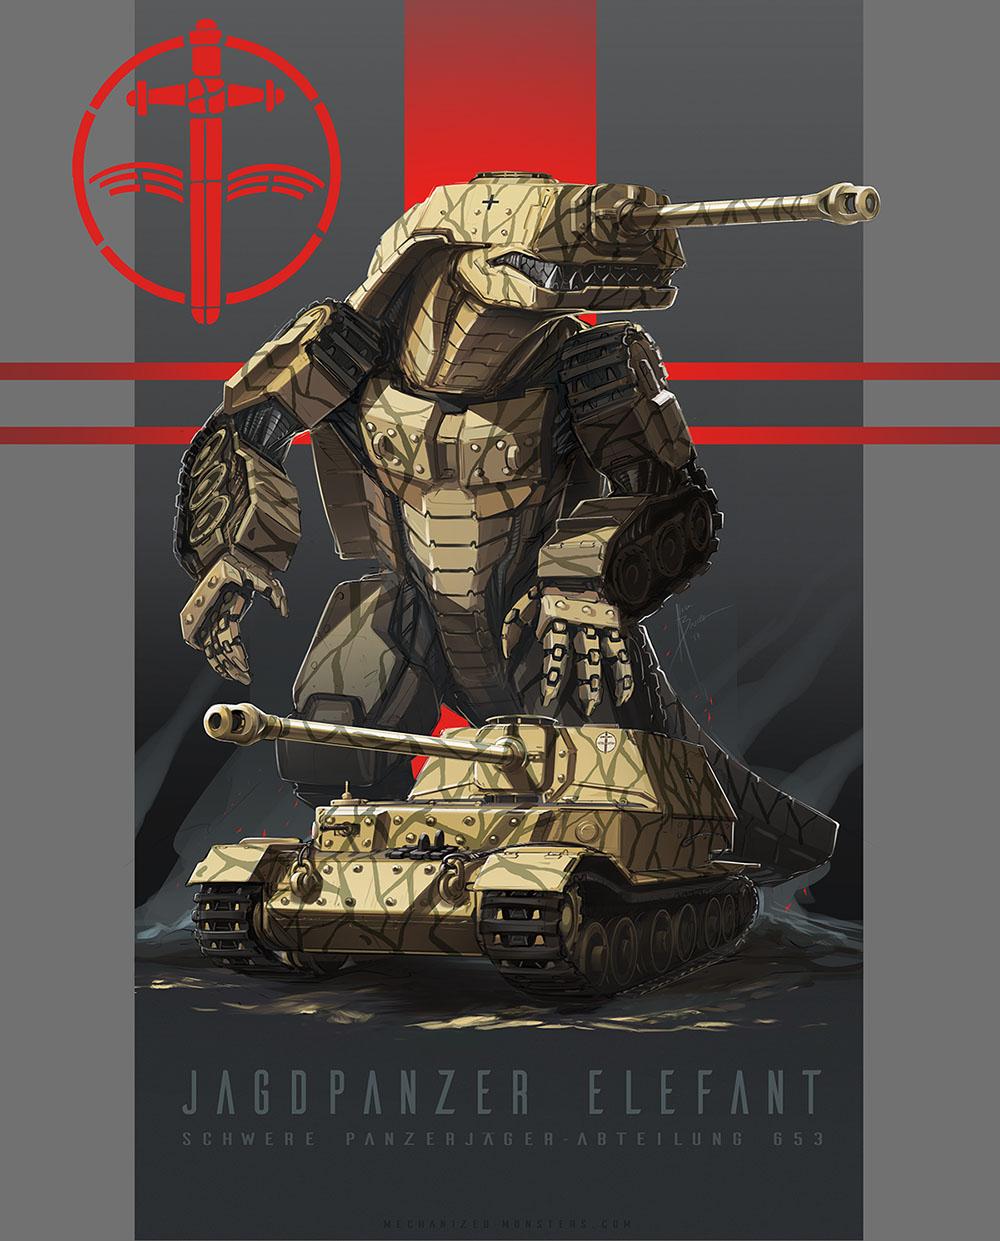 Hydrothrax_Elefant poster1000px.jpg